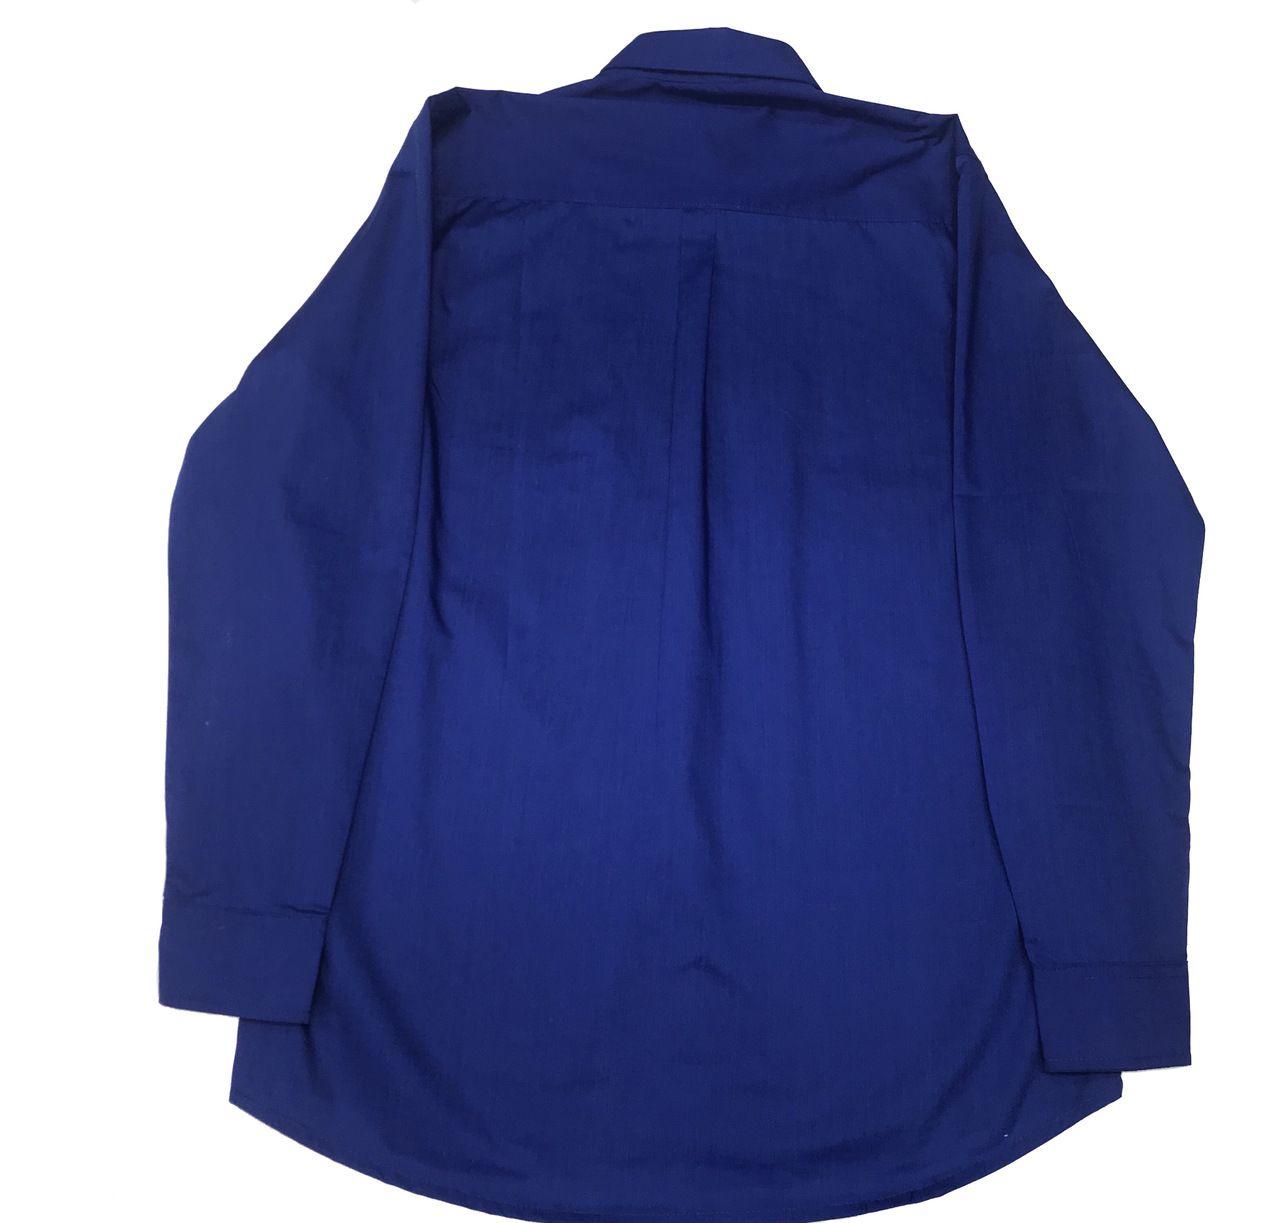 Camisa Social Mangalarga Chancela   - Boutique Mangalarga